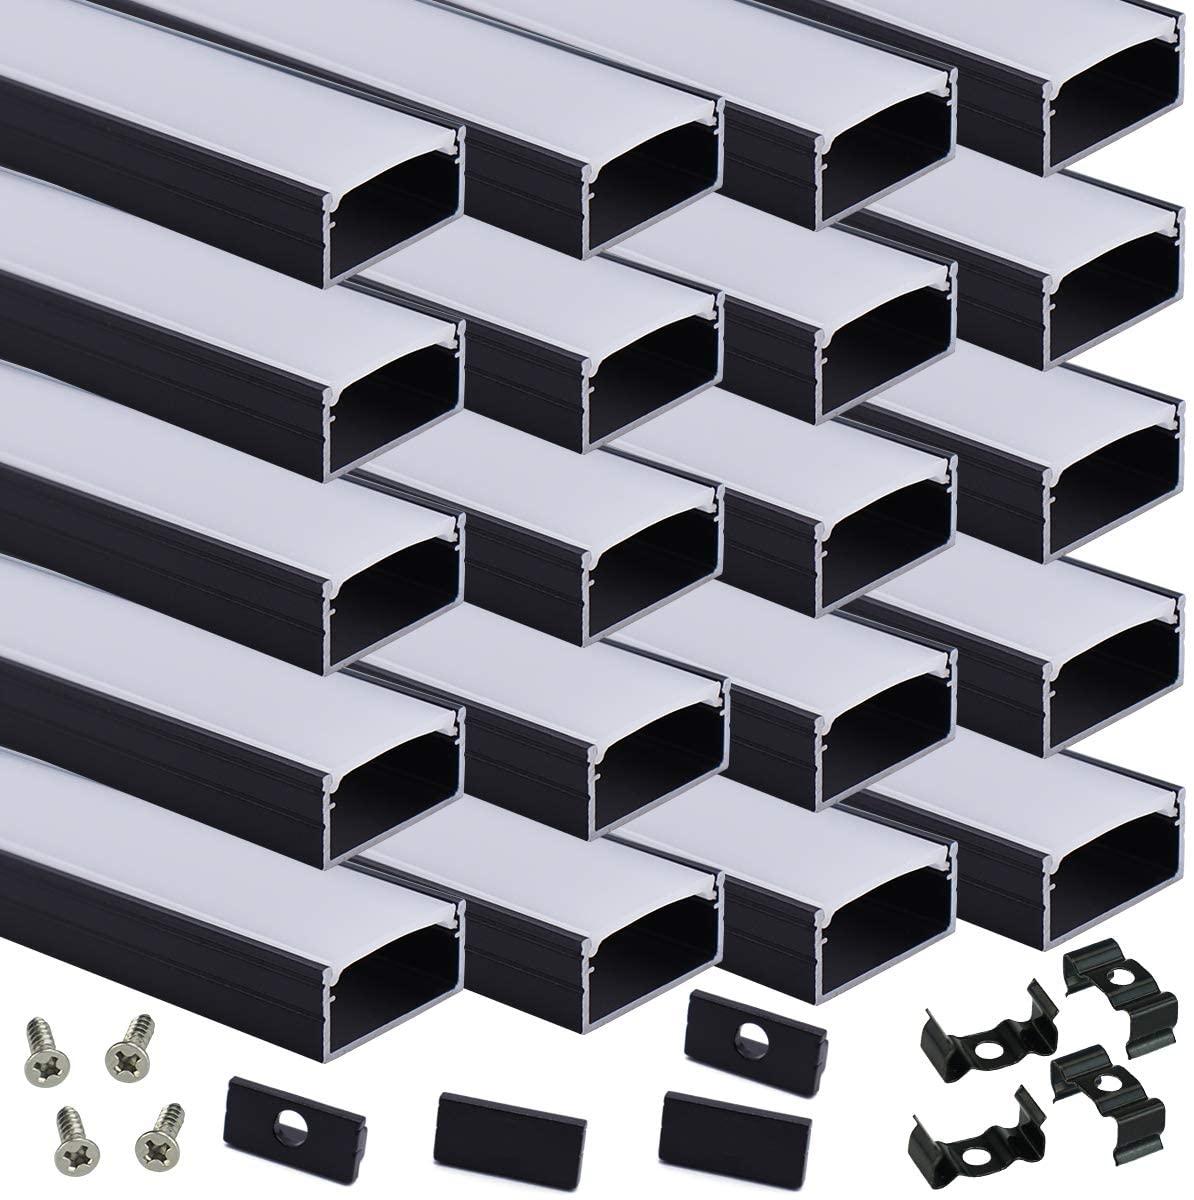 Muzata 2M Black LED Channel System with Milky White Cover,16mm Super Wide Aluminum Extrusion Profile Track Diffuser for Tape Strip Light Philips Hue Plus.U Shape,20Pack 6.6Ft U102 BW 2M, LU2 LP1 L2M